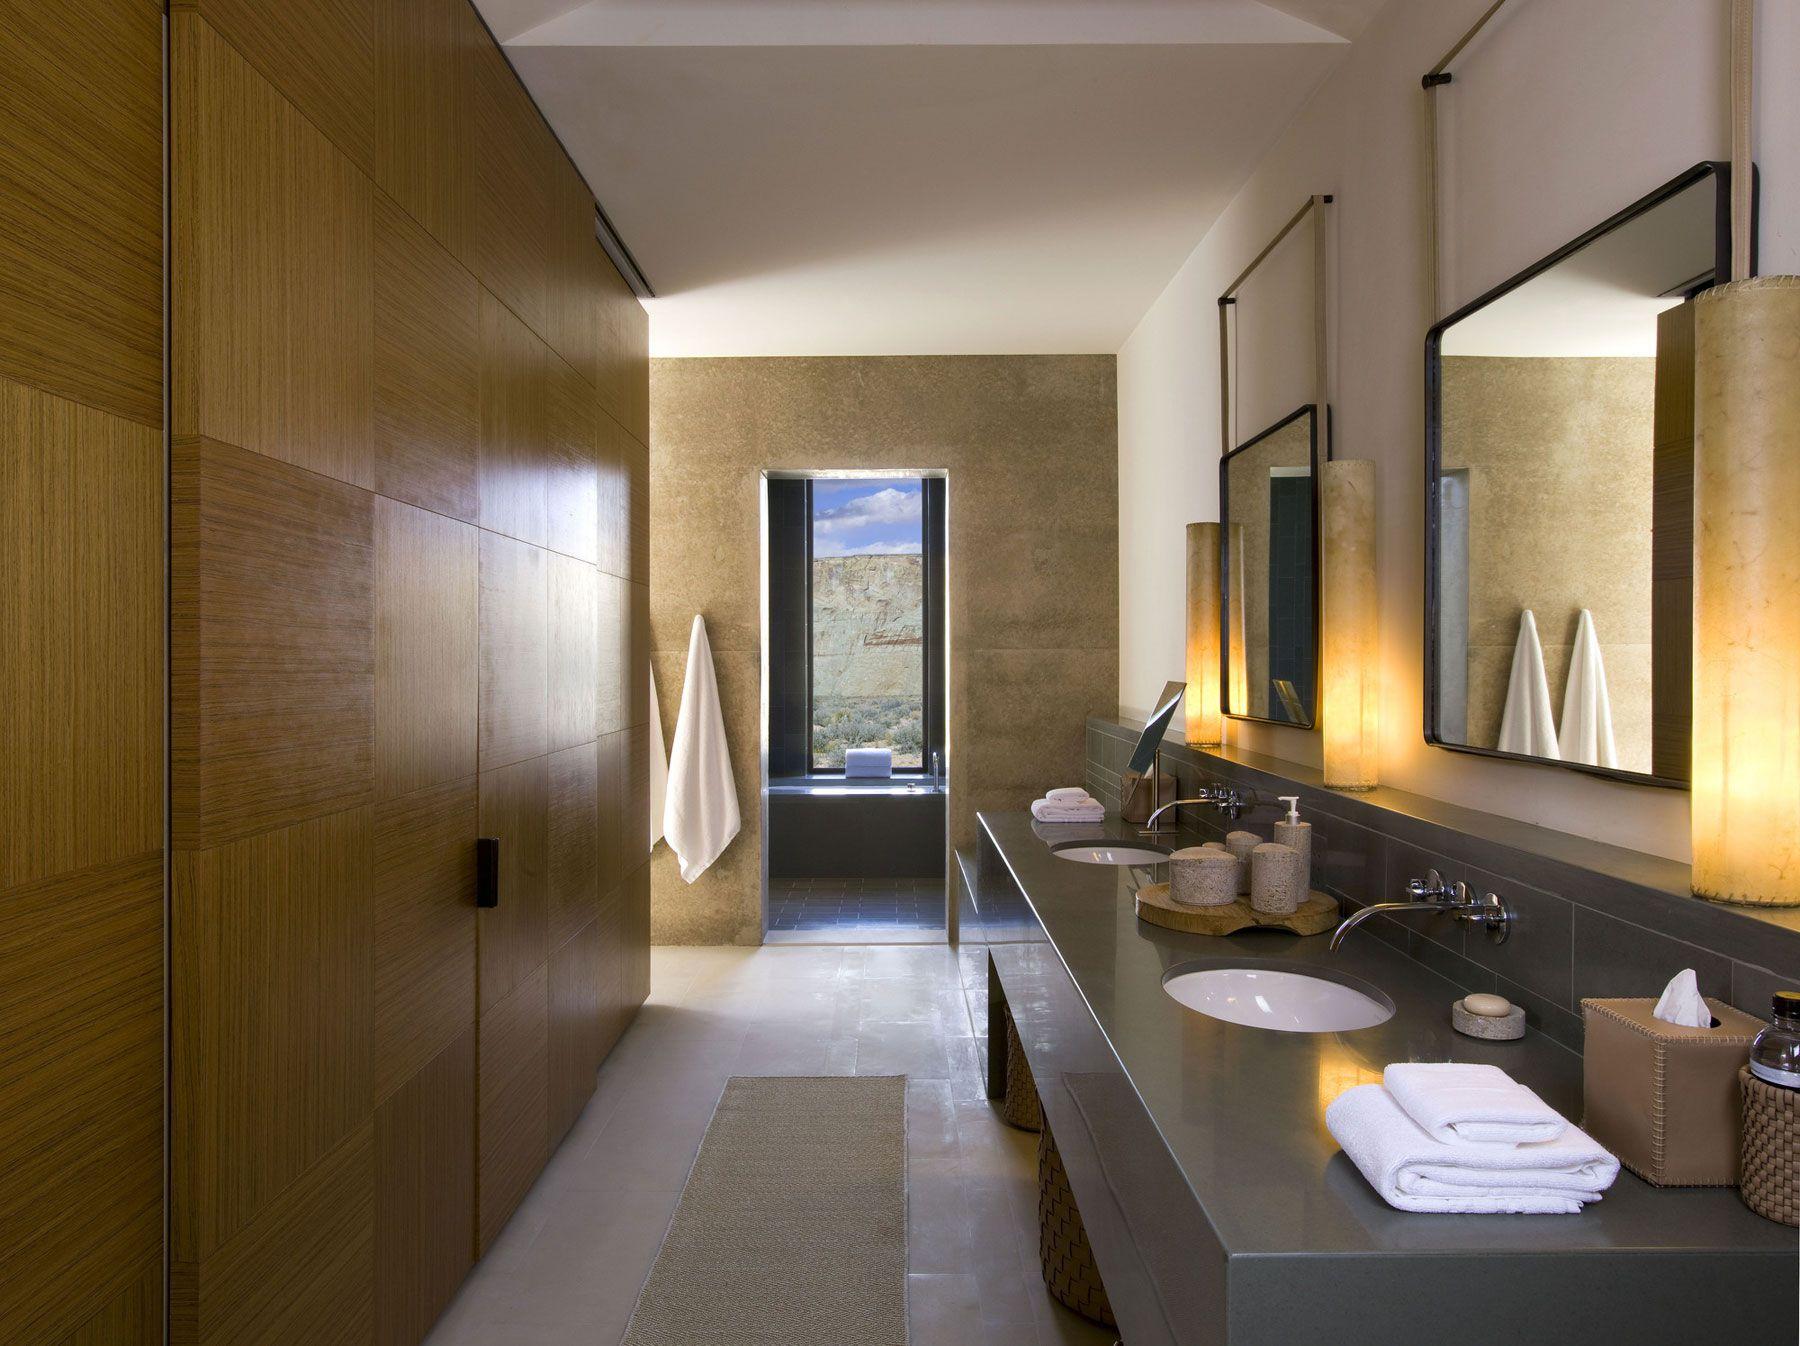 Amangiri-Luxury-Resort-Hotel-in-Canyon-Point-12